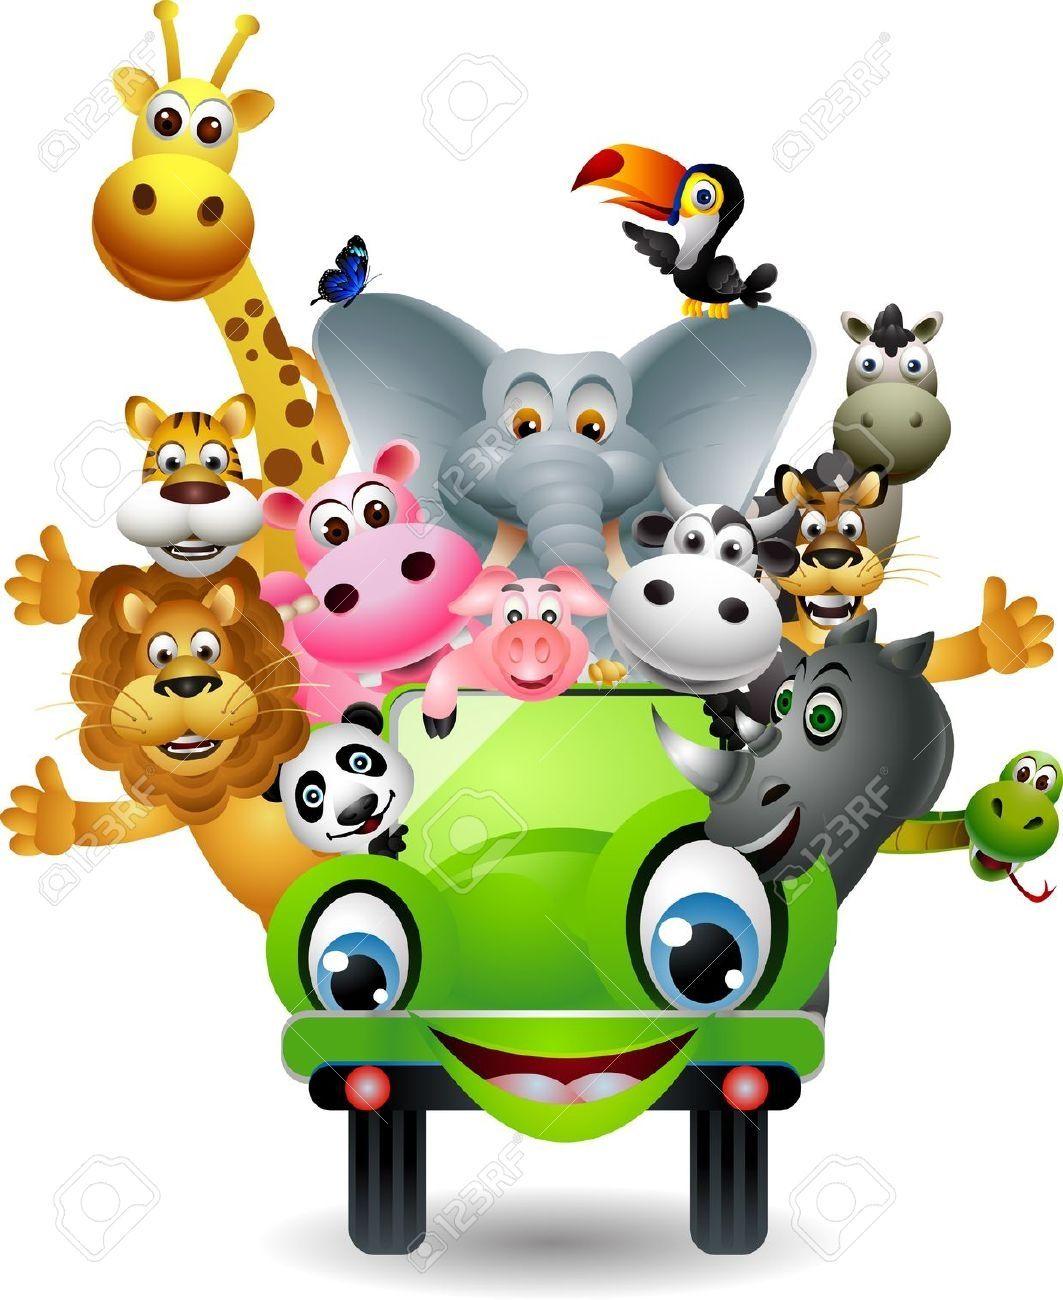 Funny Animals Cartoon Safari Animals Clipart 1731 Cartoon Animals Animal Clipart Funny Animals